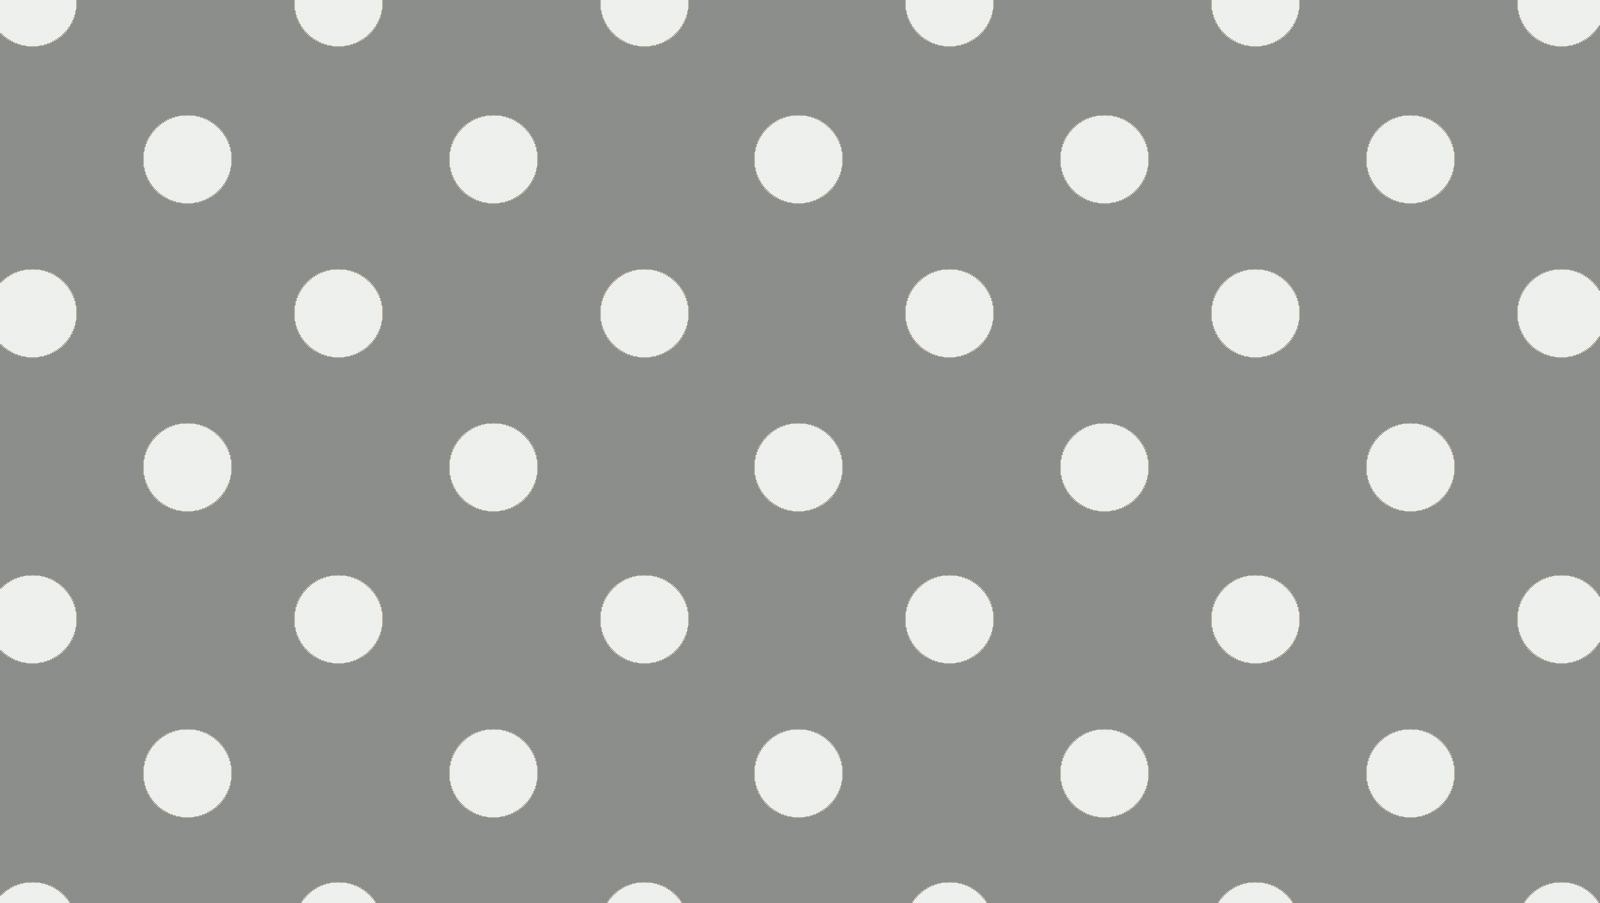 Polka dot wallpaper for computer wallpapersafari for Polka dot wallpaper